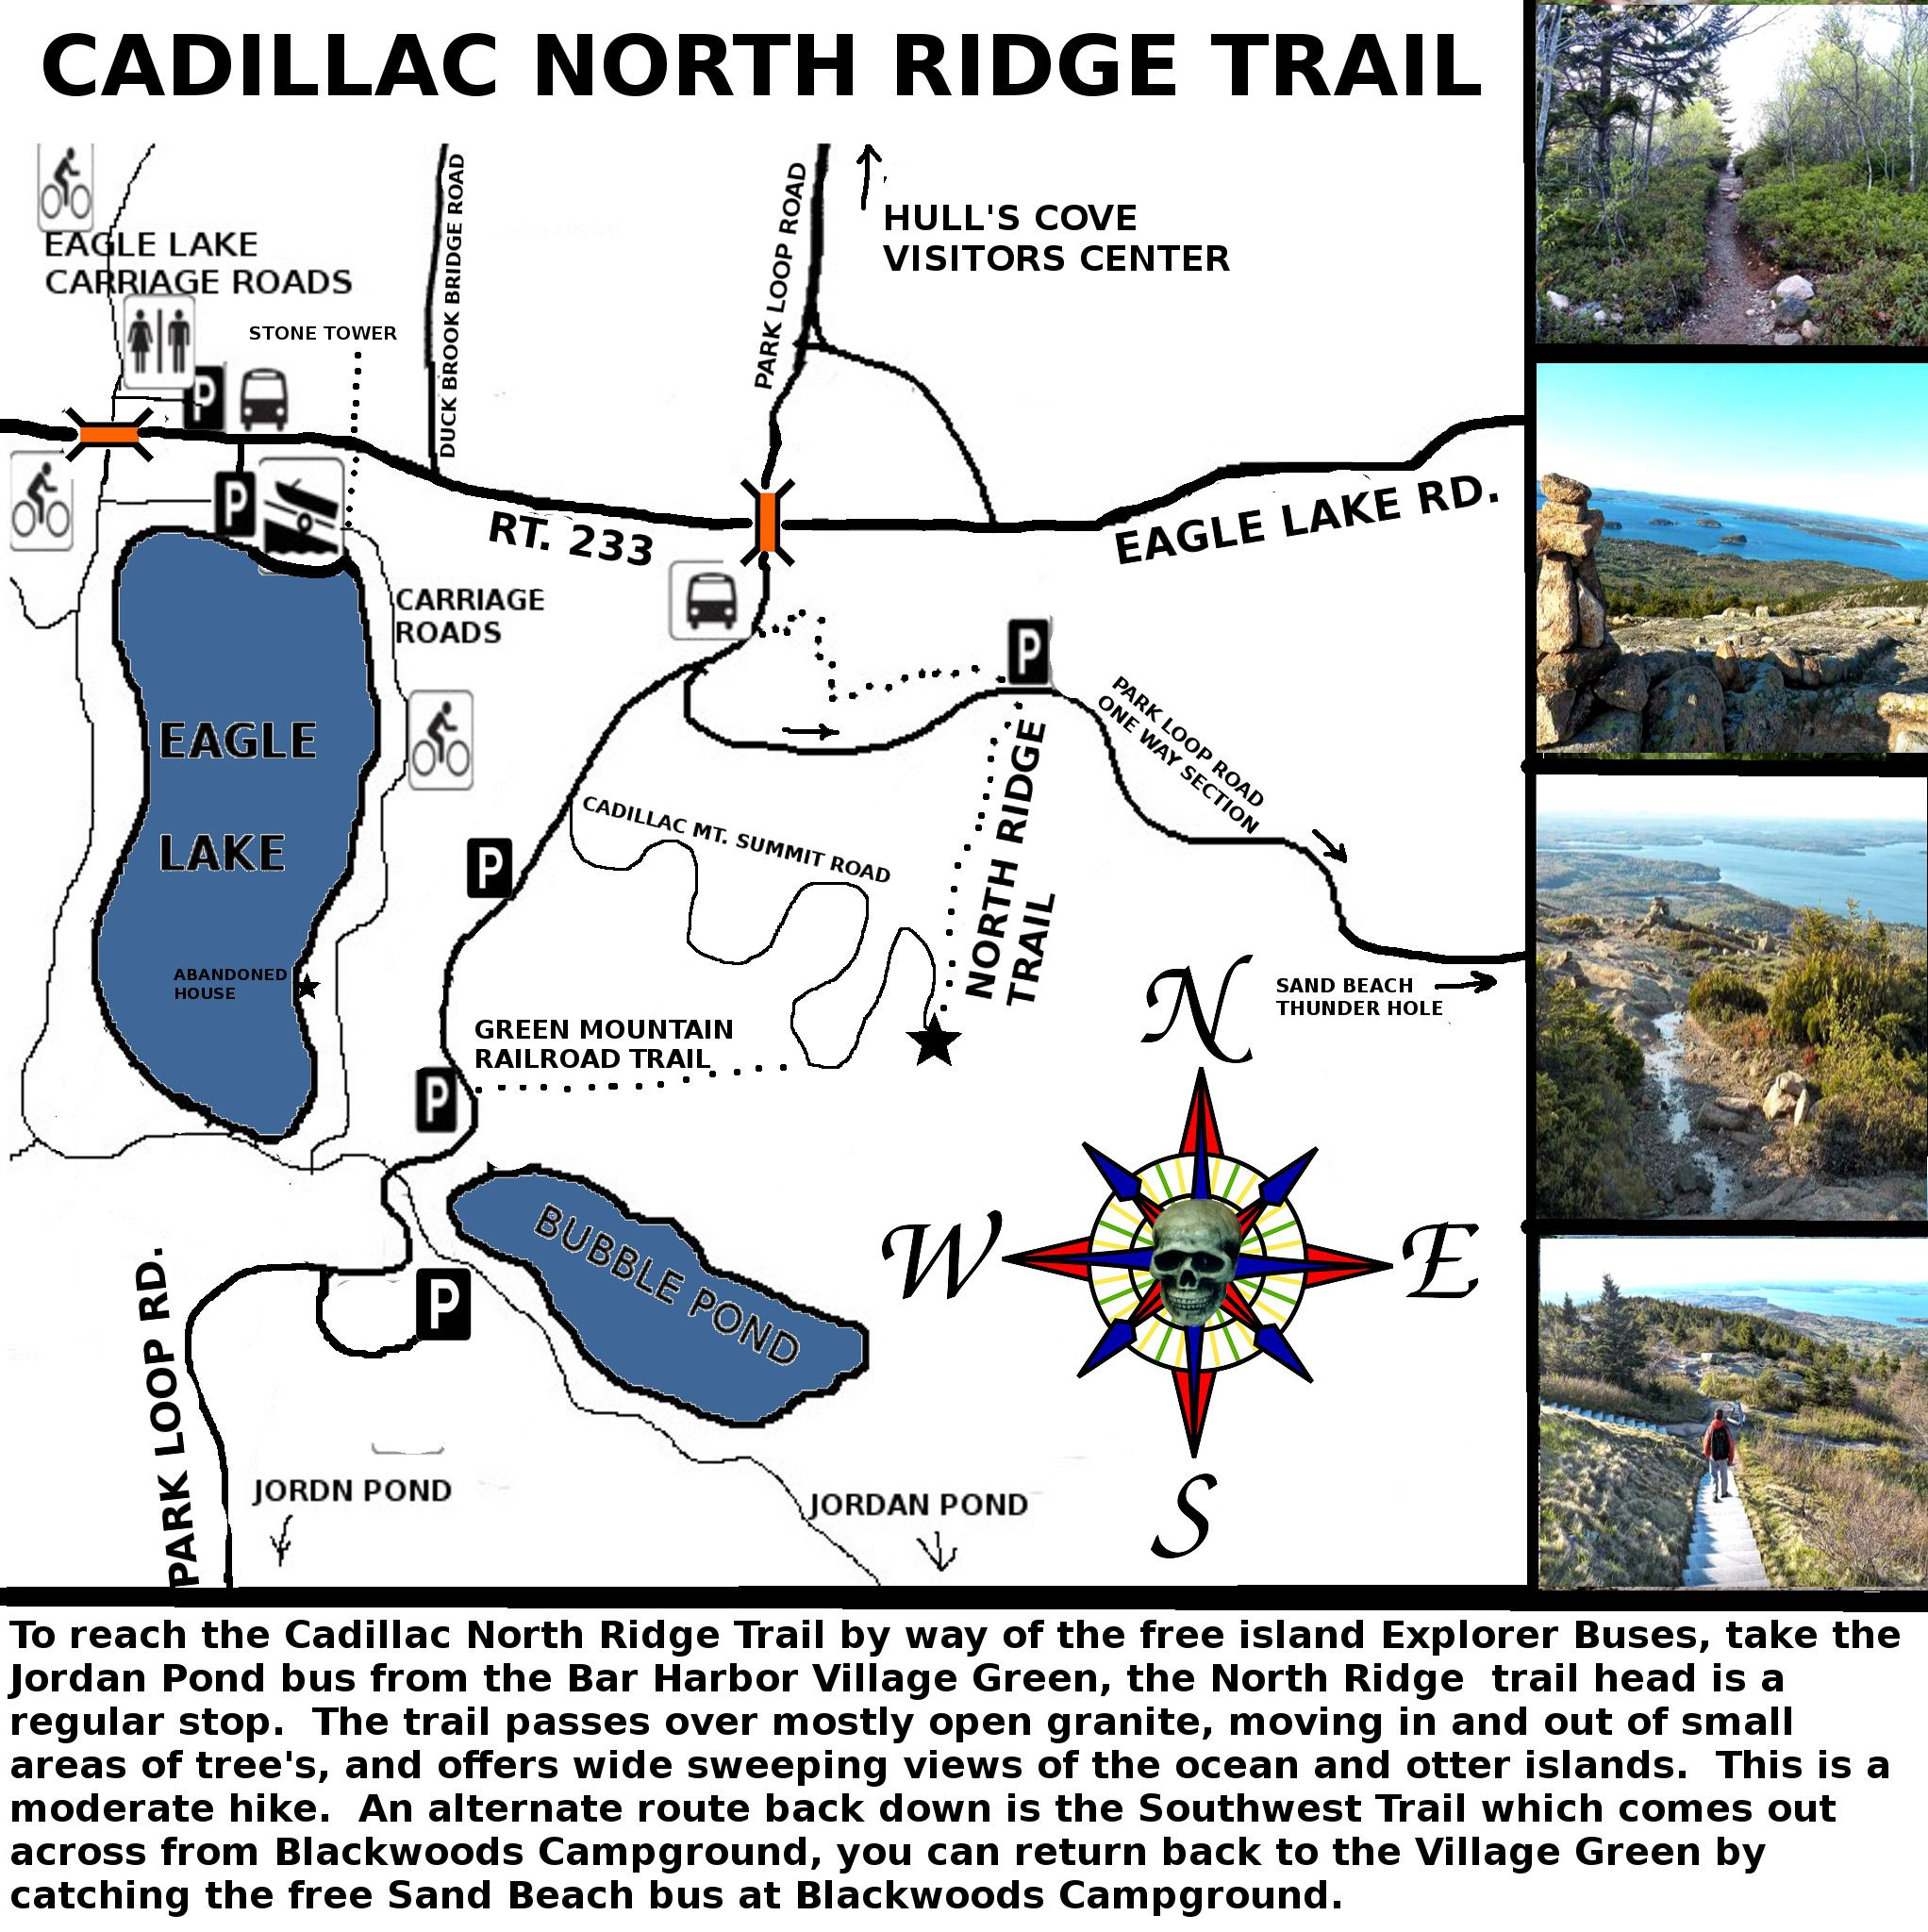 cadillac mountain north ridge trail - acadia national park. this is